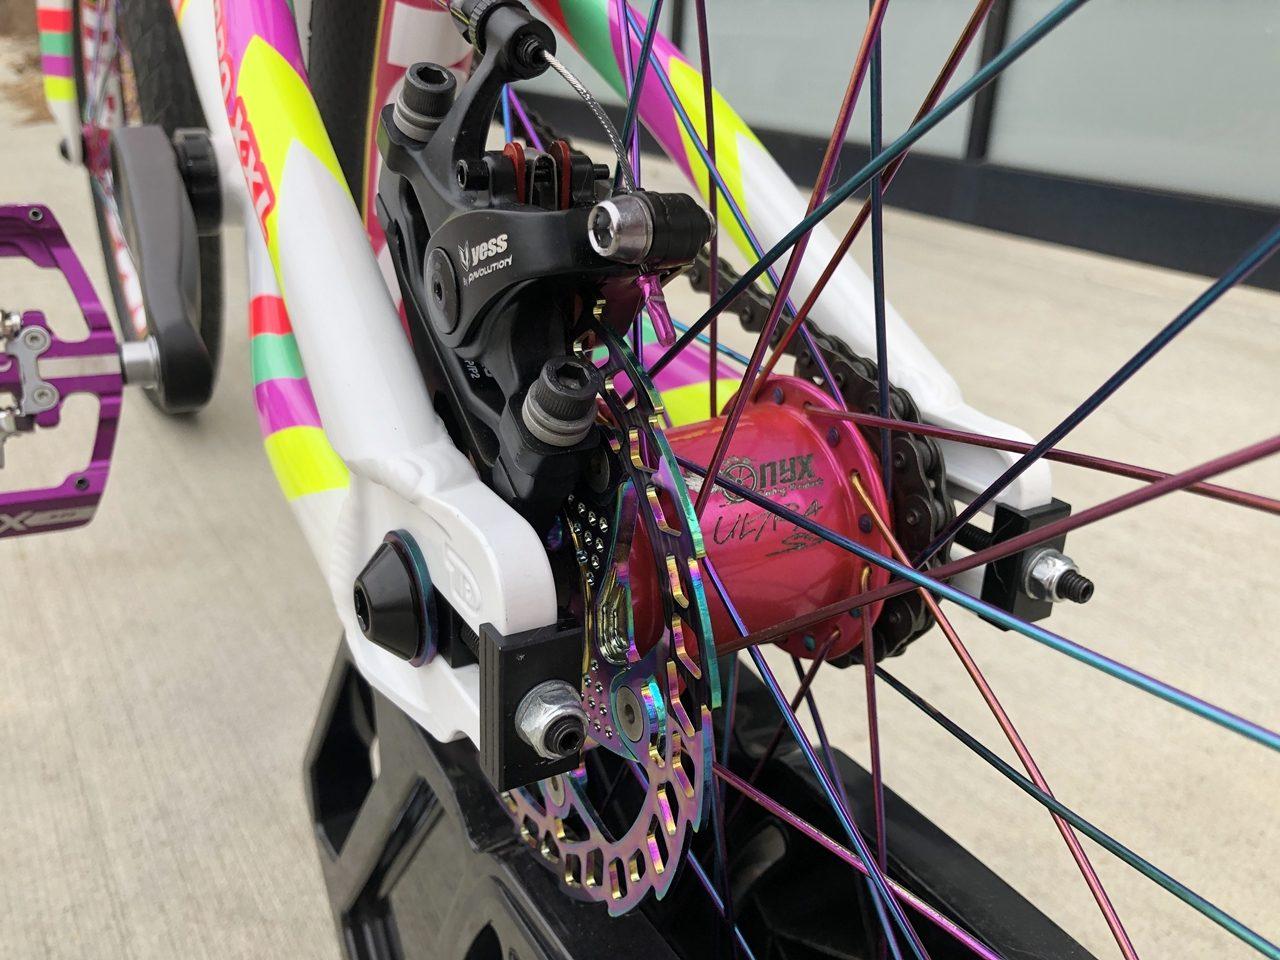 Throdwn XXL BMX disc brake